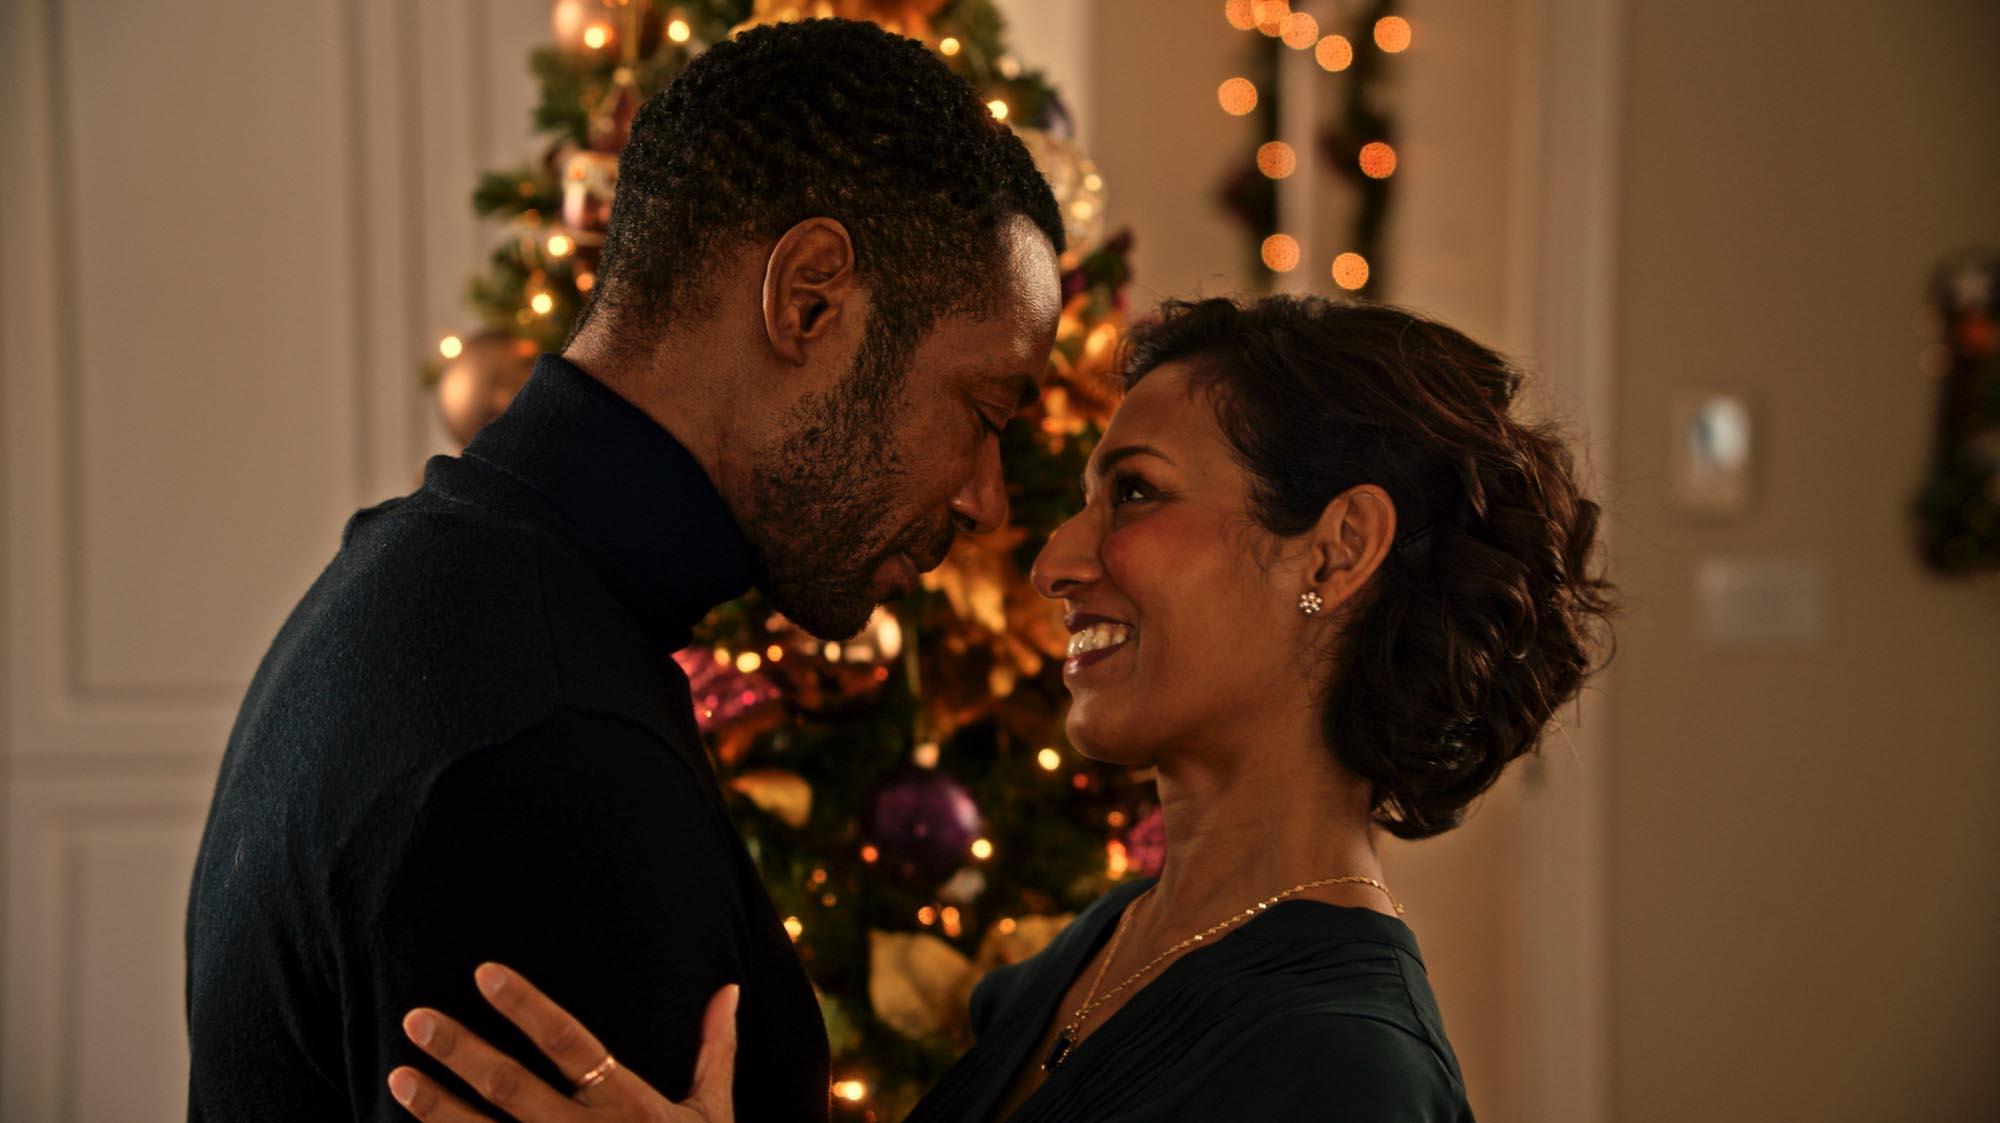 2021 Lifetime Christmas Movies Baking Spirits Bright